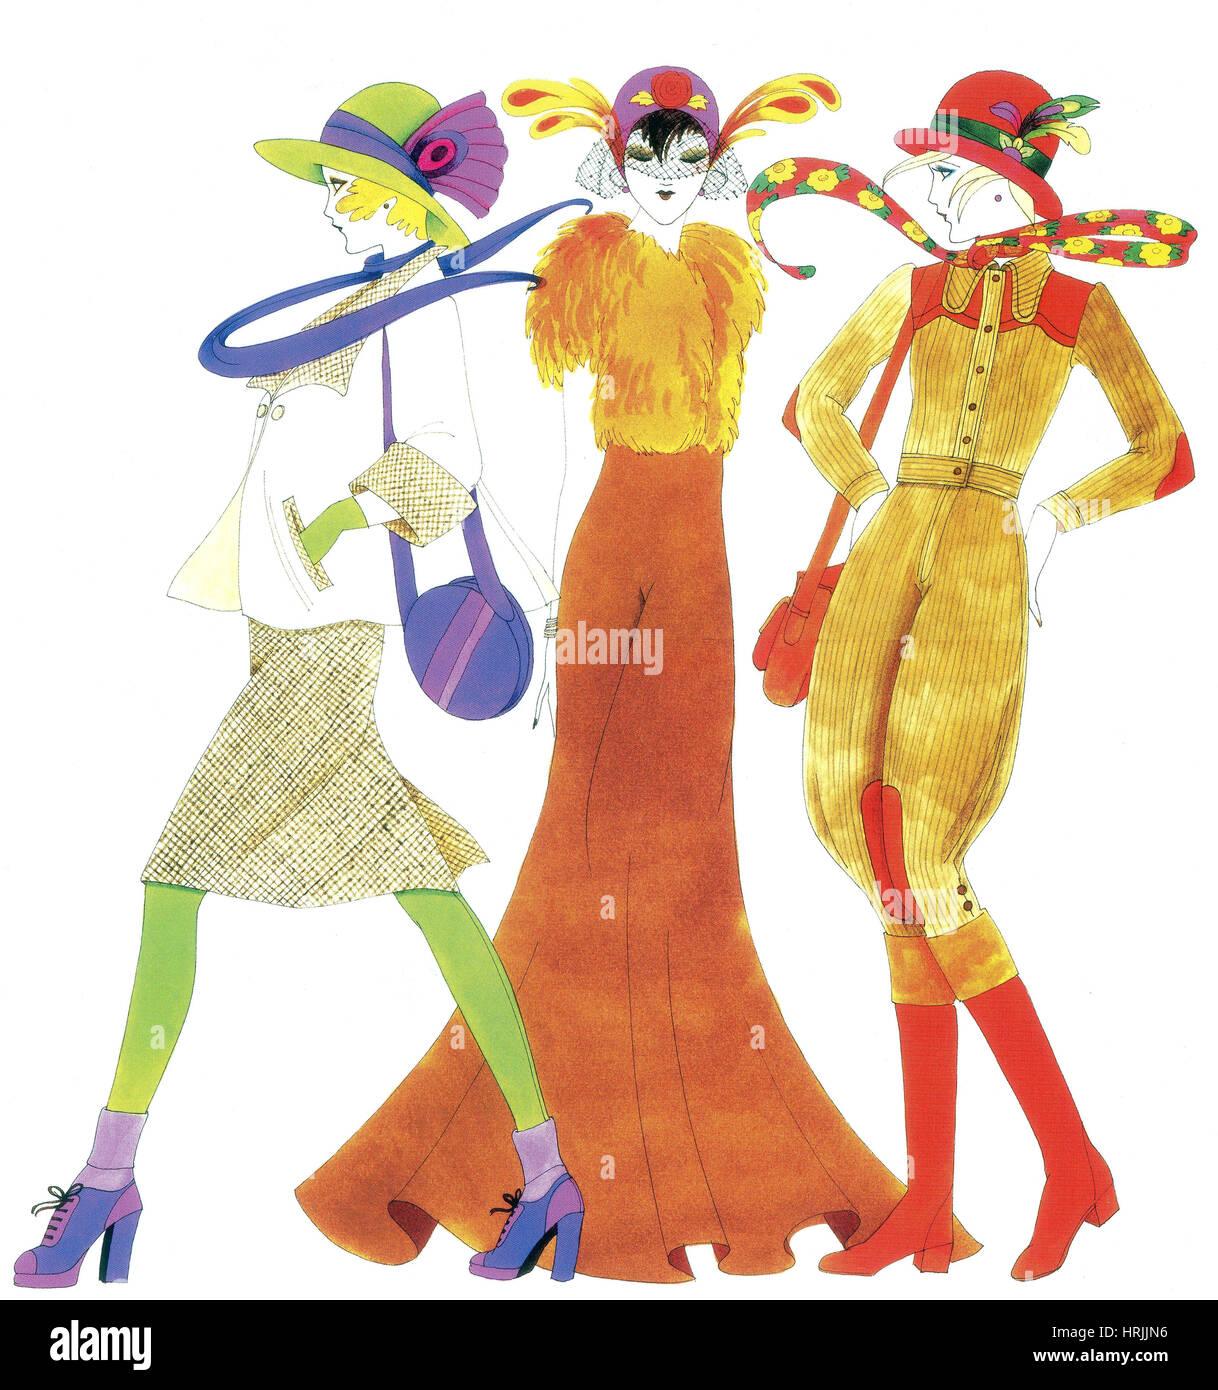 Women's Fashion, 1970 - Stock Image